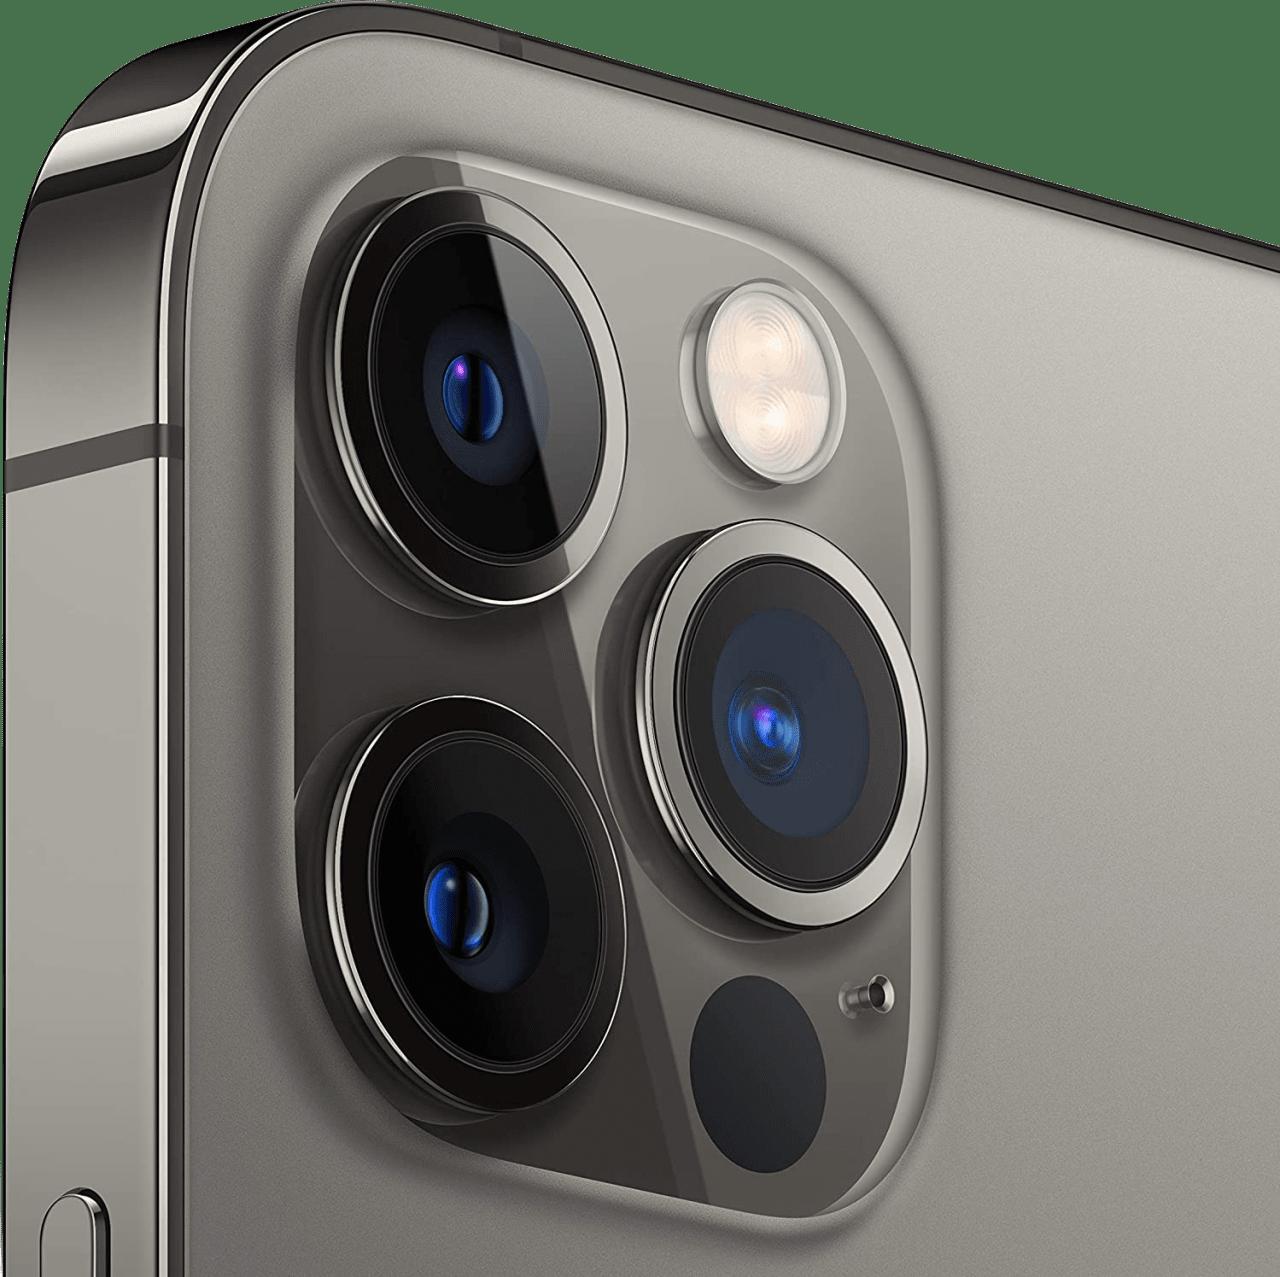 Grau Apple iPhone 12 Pro 128GB.3